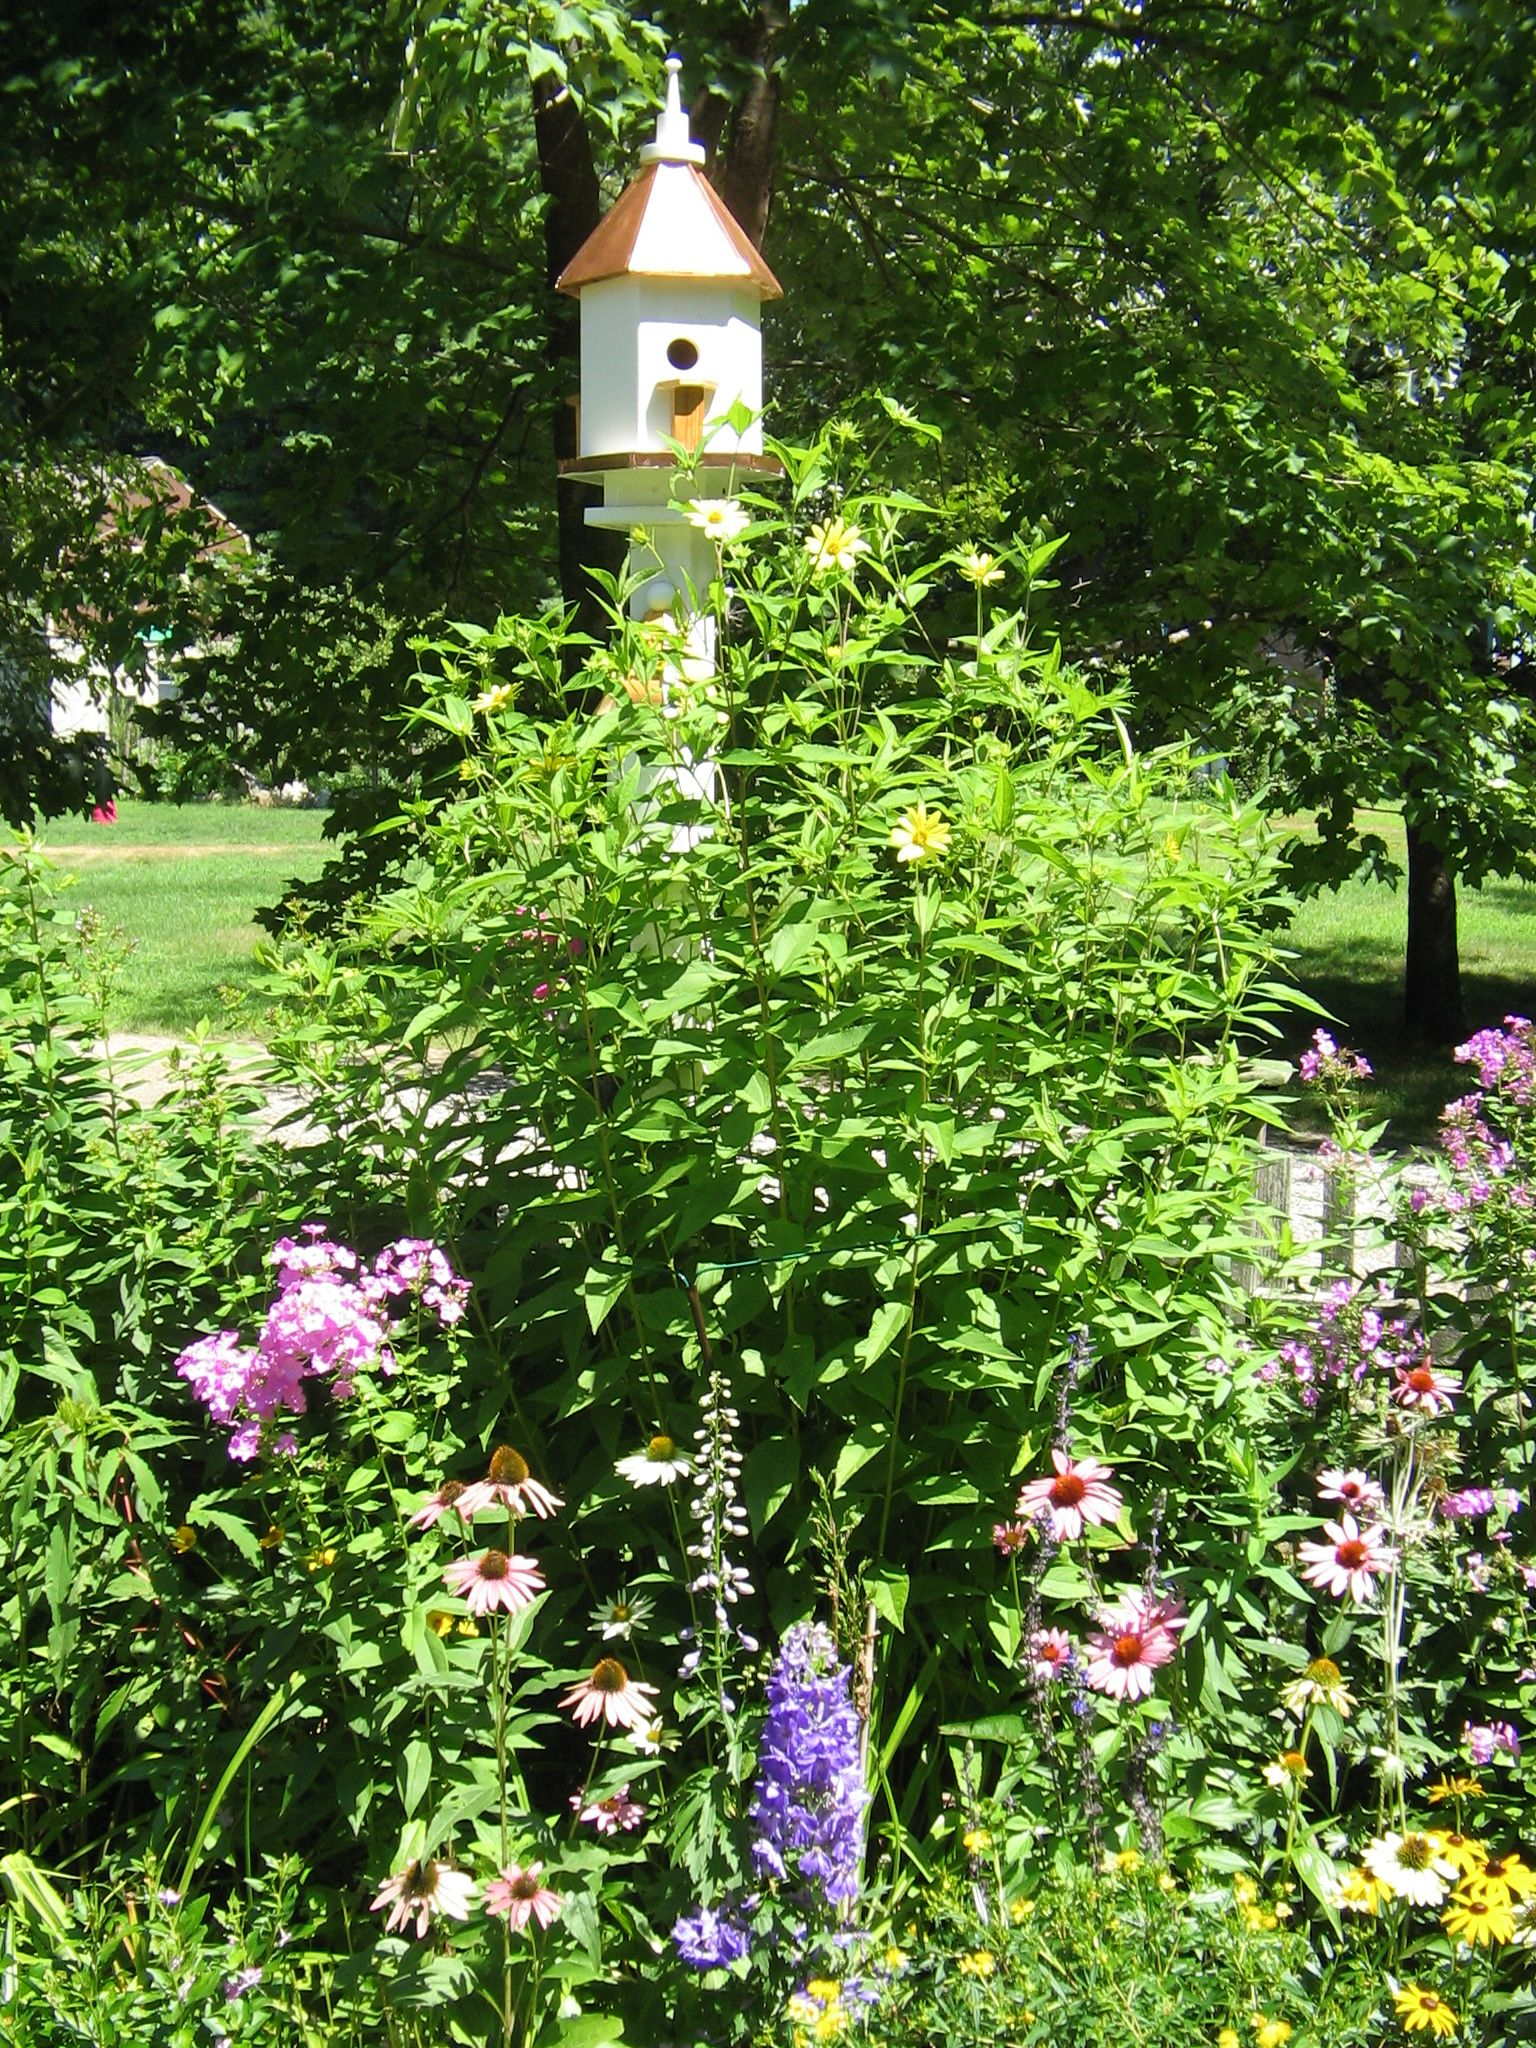 By Gina Marino, Certified Wildlife Garden, Purple Coneflower, Coreopsis, Roses,